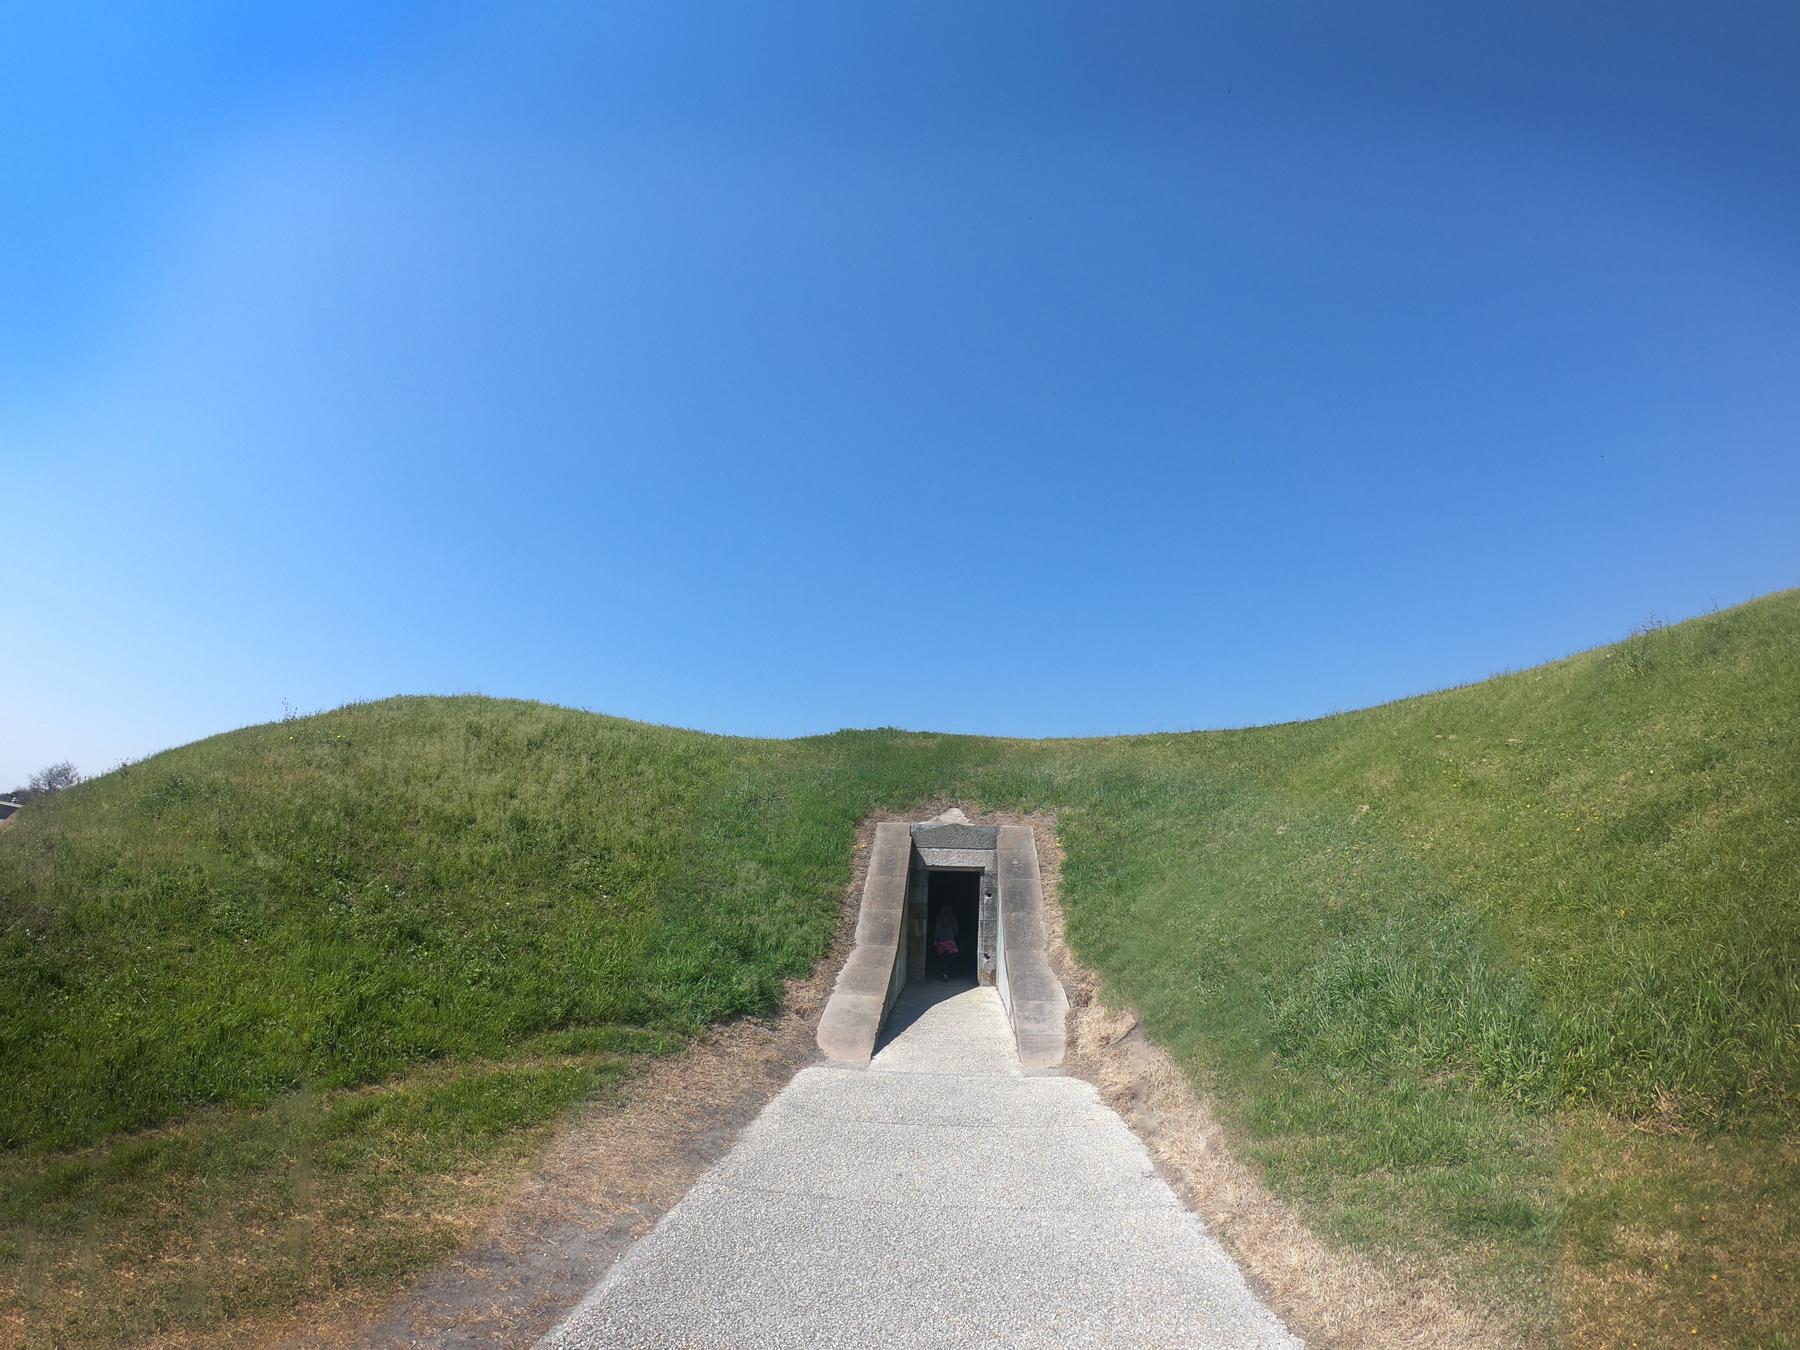 Entrance door to bunker at Fort Pulaski National Monument, Georgia